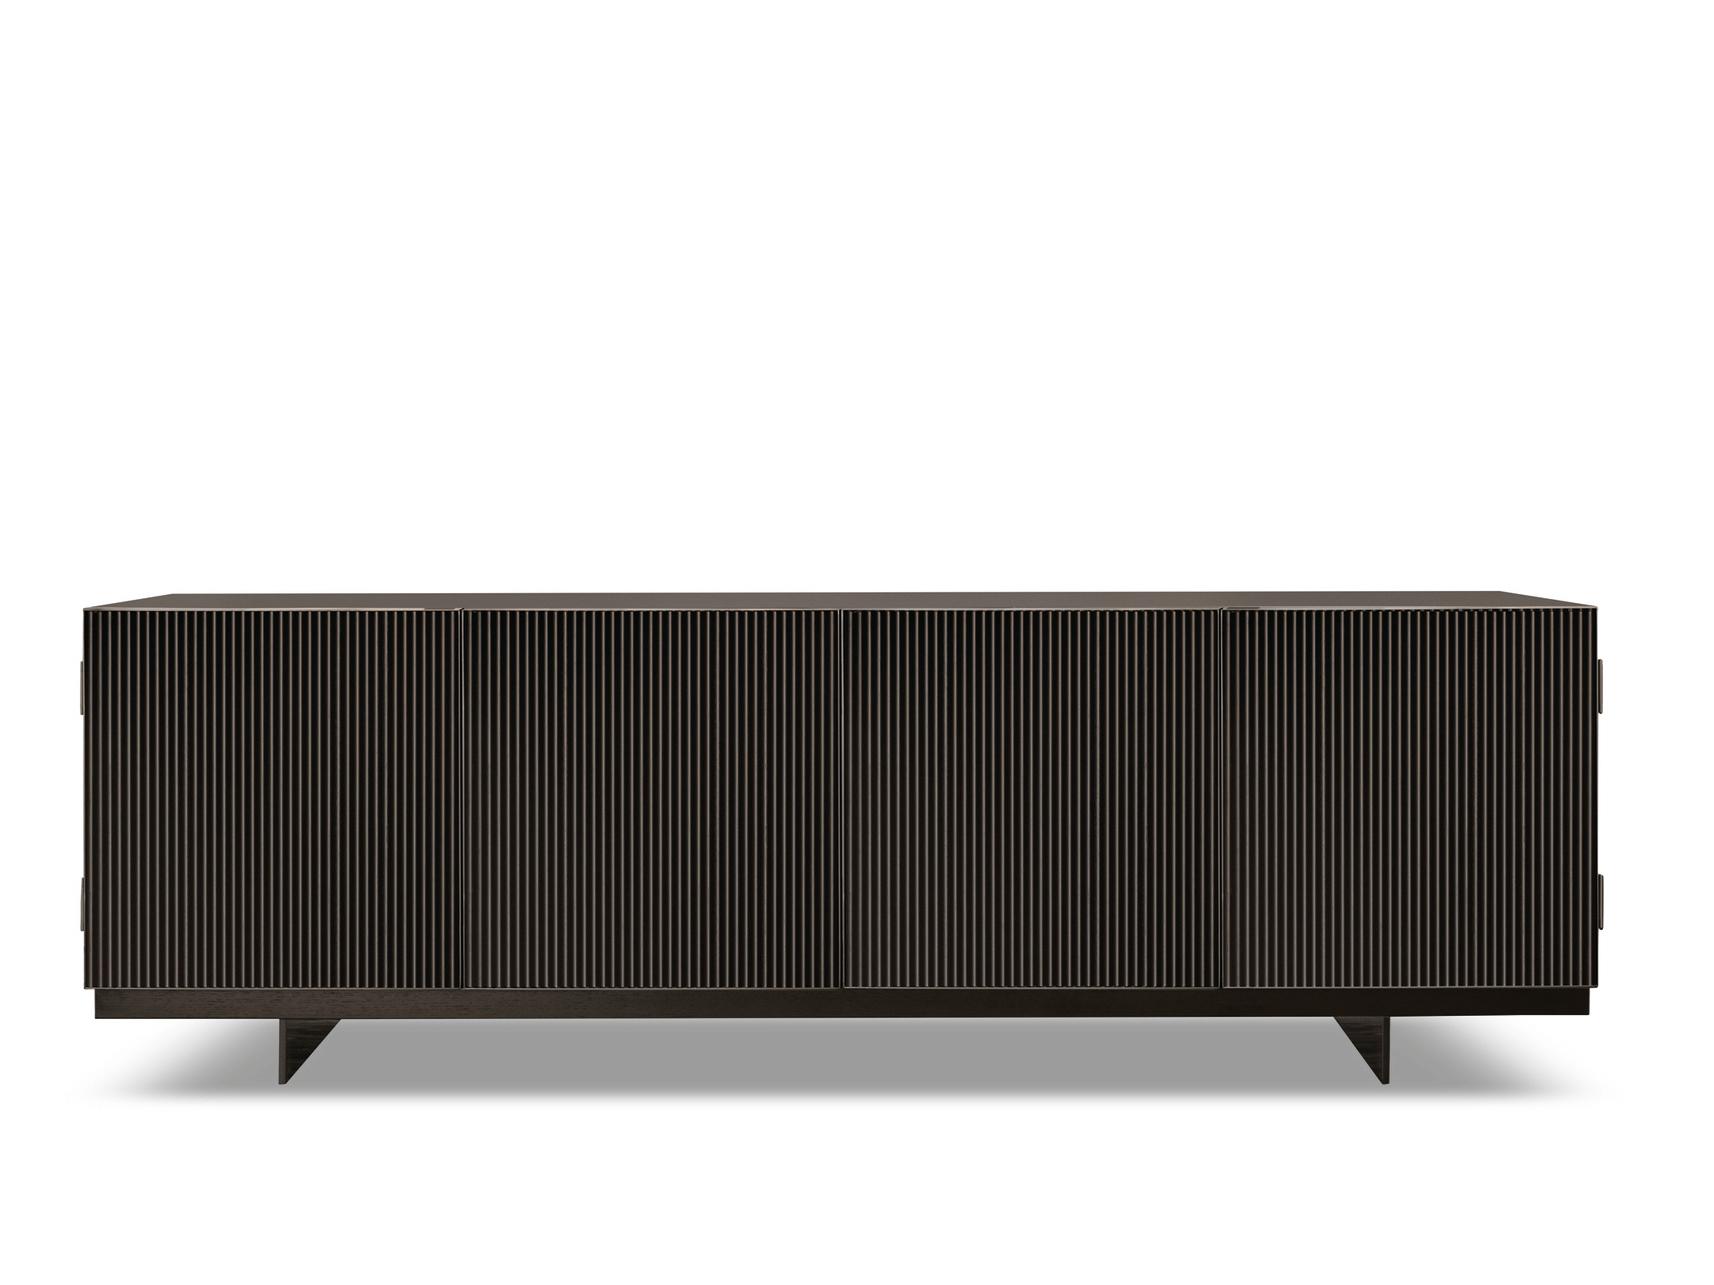 Aylon Sideboard by Rodolfo Dordoni for Minotti